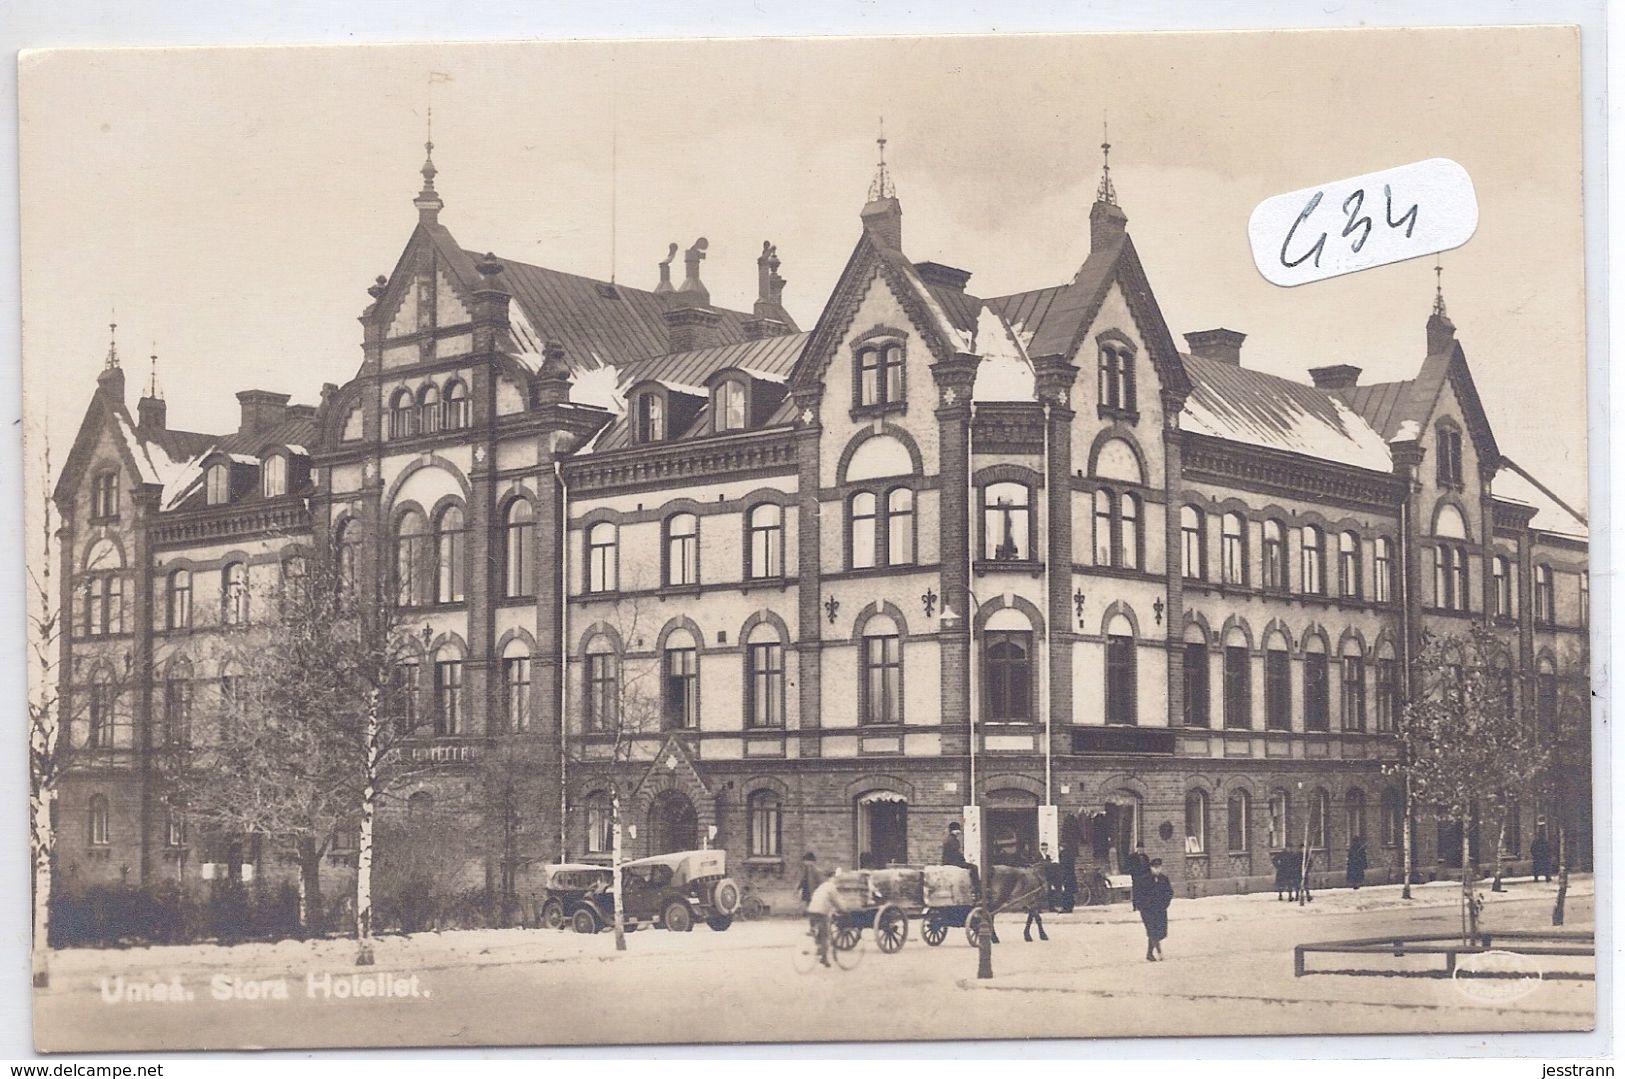 UMAA- STORA HOTELLET - Zweden